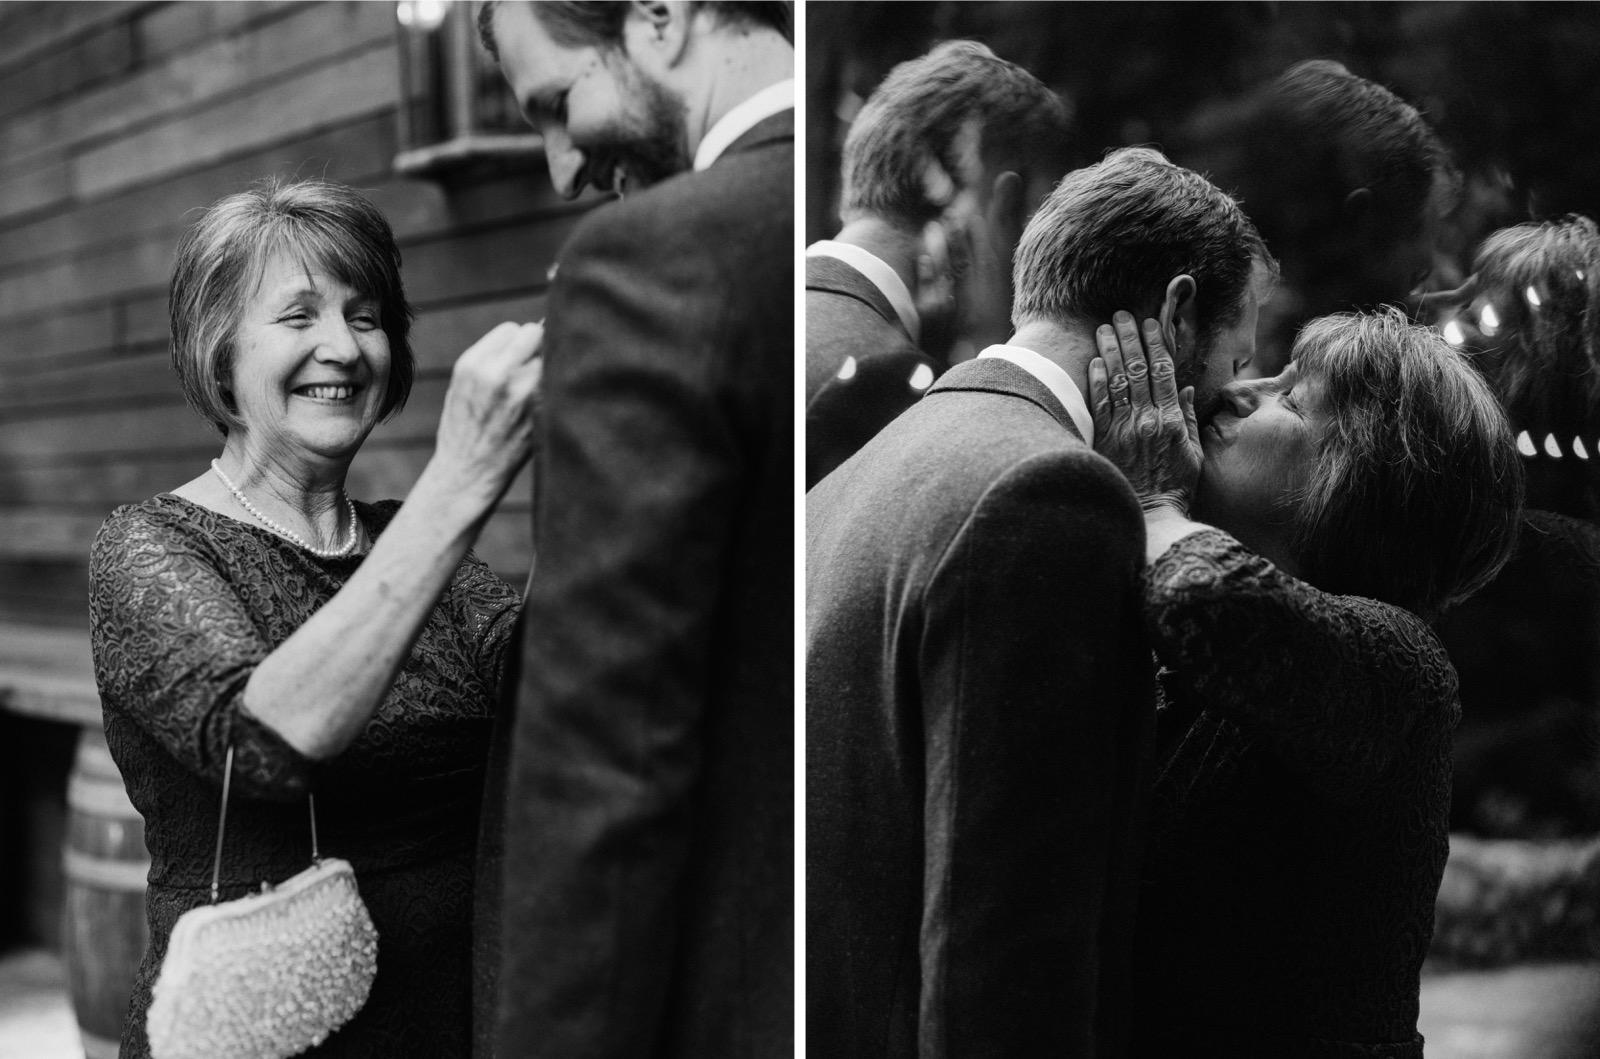 039_Emily & Jeff Wedding 0293_Emily & Jeff Wedding 0290_mother_moments_wedding